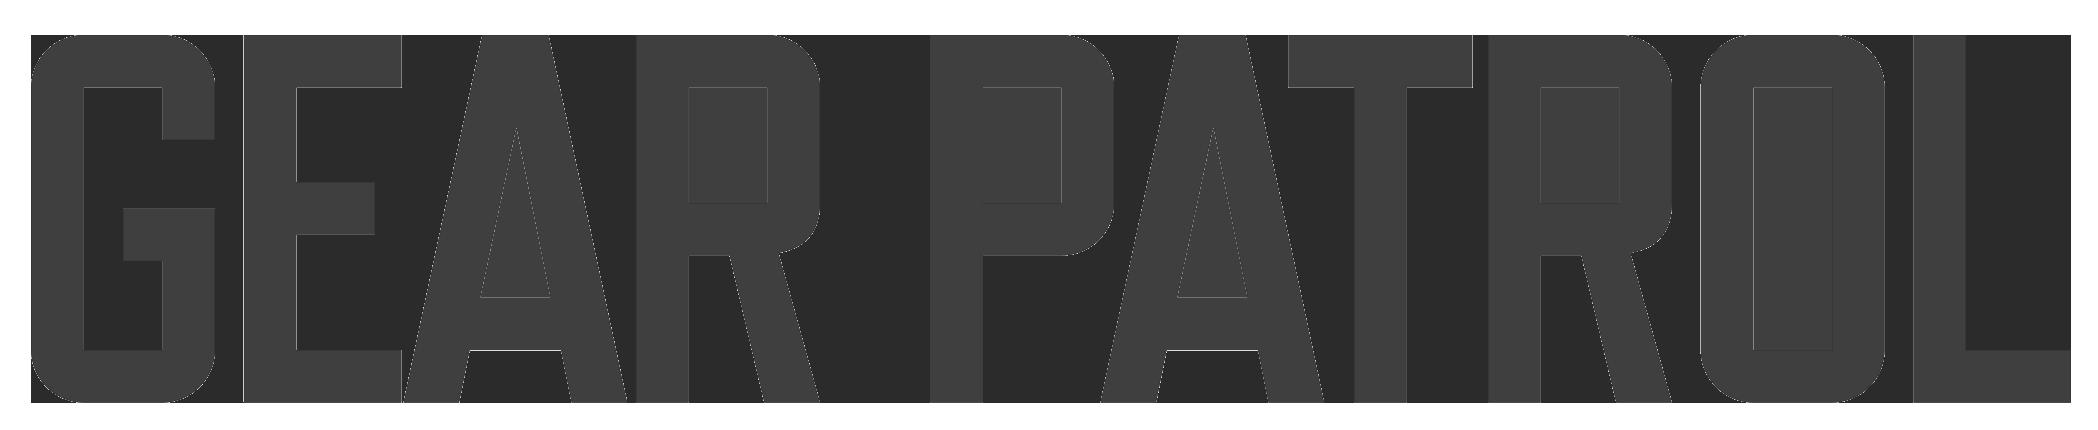 gp-masthead-logo grey.png